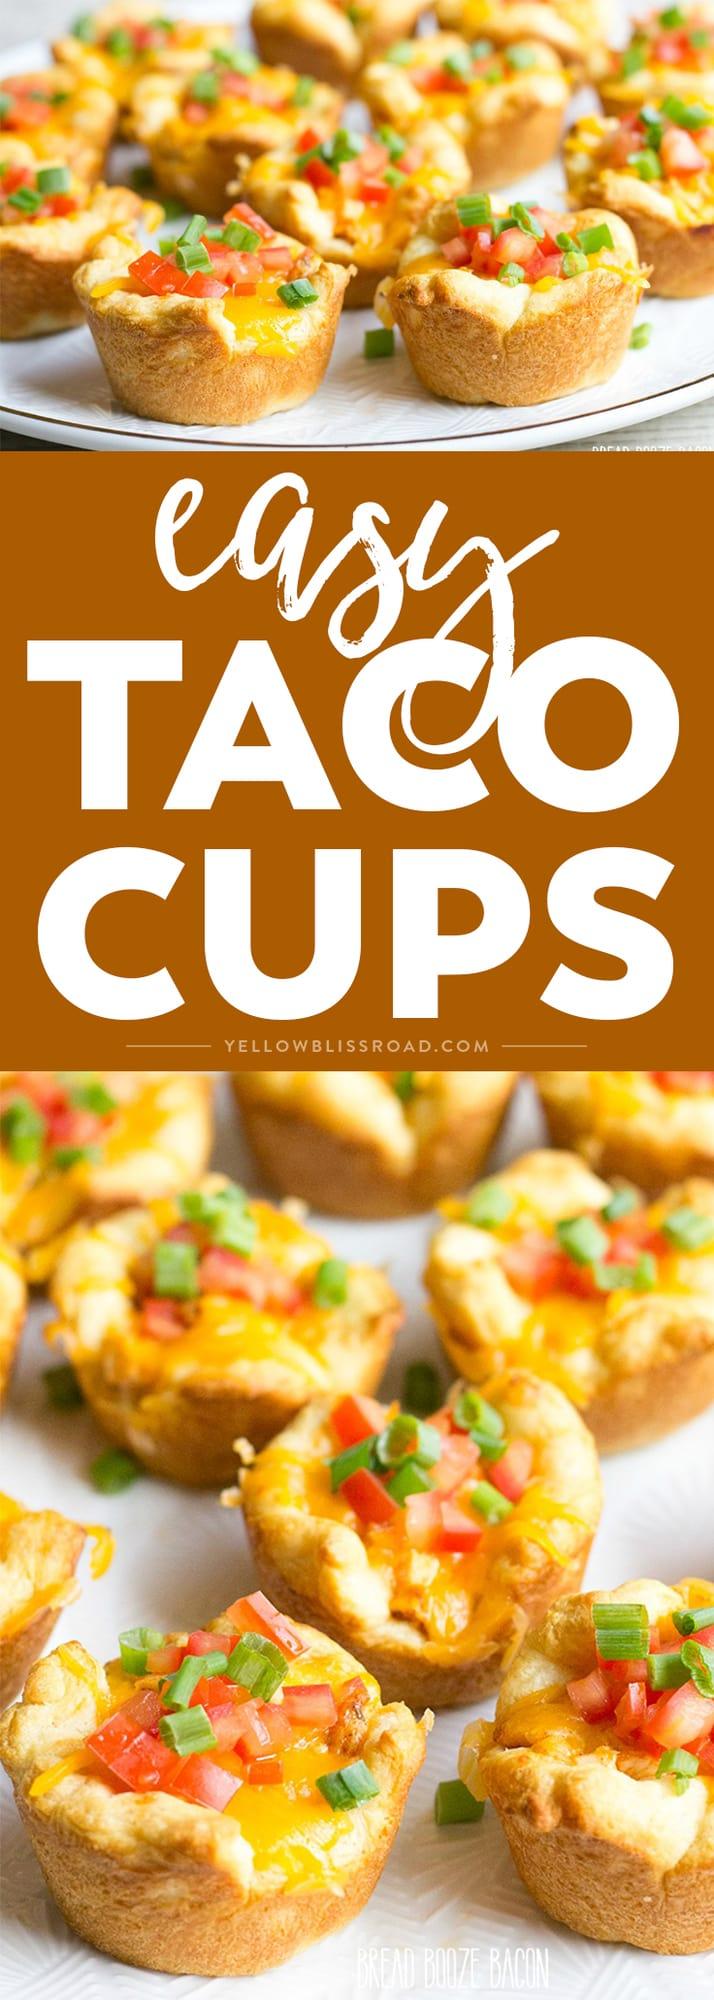 Social media image of Taco Cups